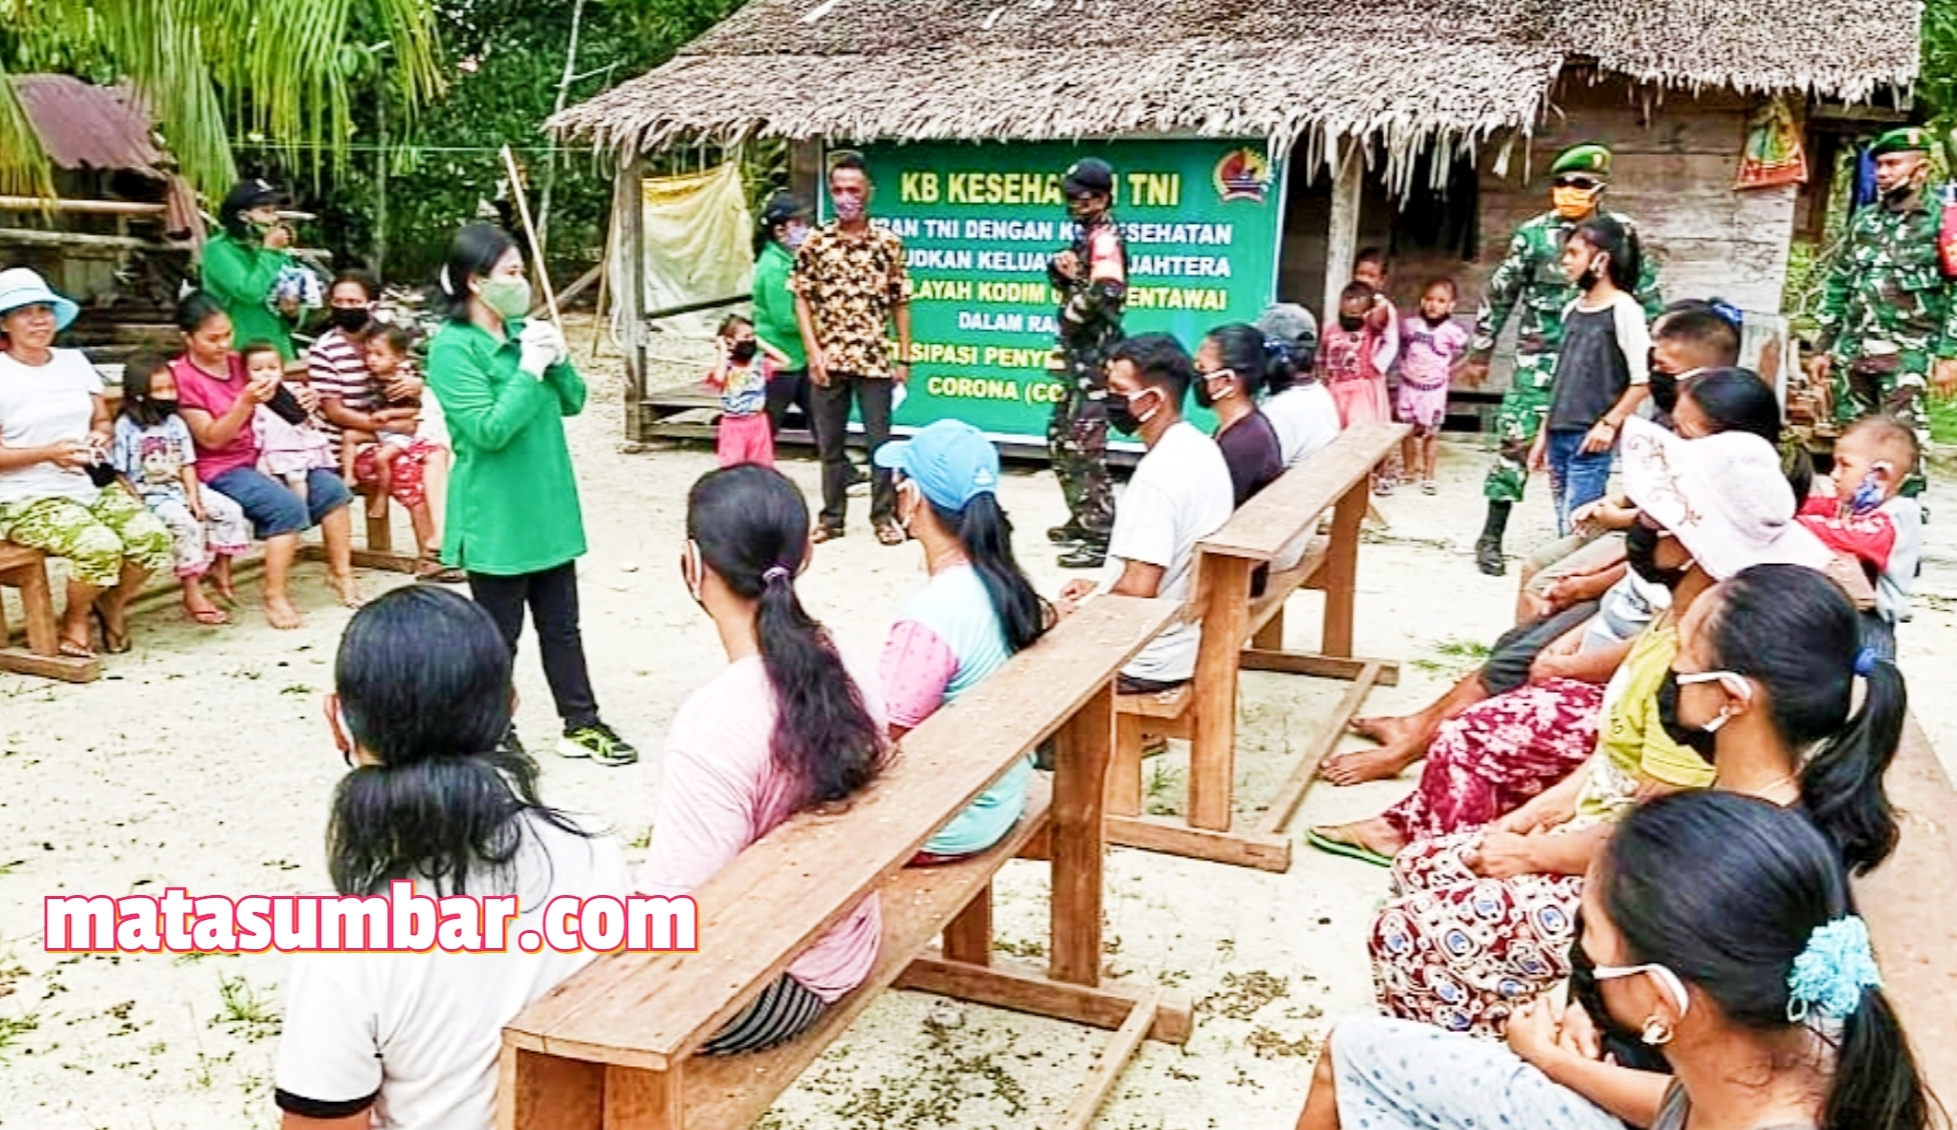 Ketua Persit KCK Cabang Kodim 0319/Mentawai Sosialisasikan Disiplin Kesehatan Kepada Masyarakat Dusun Berkat